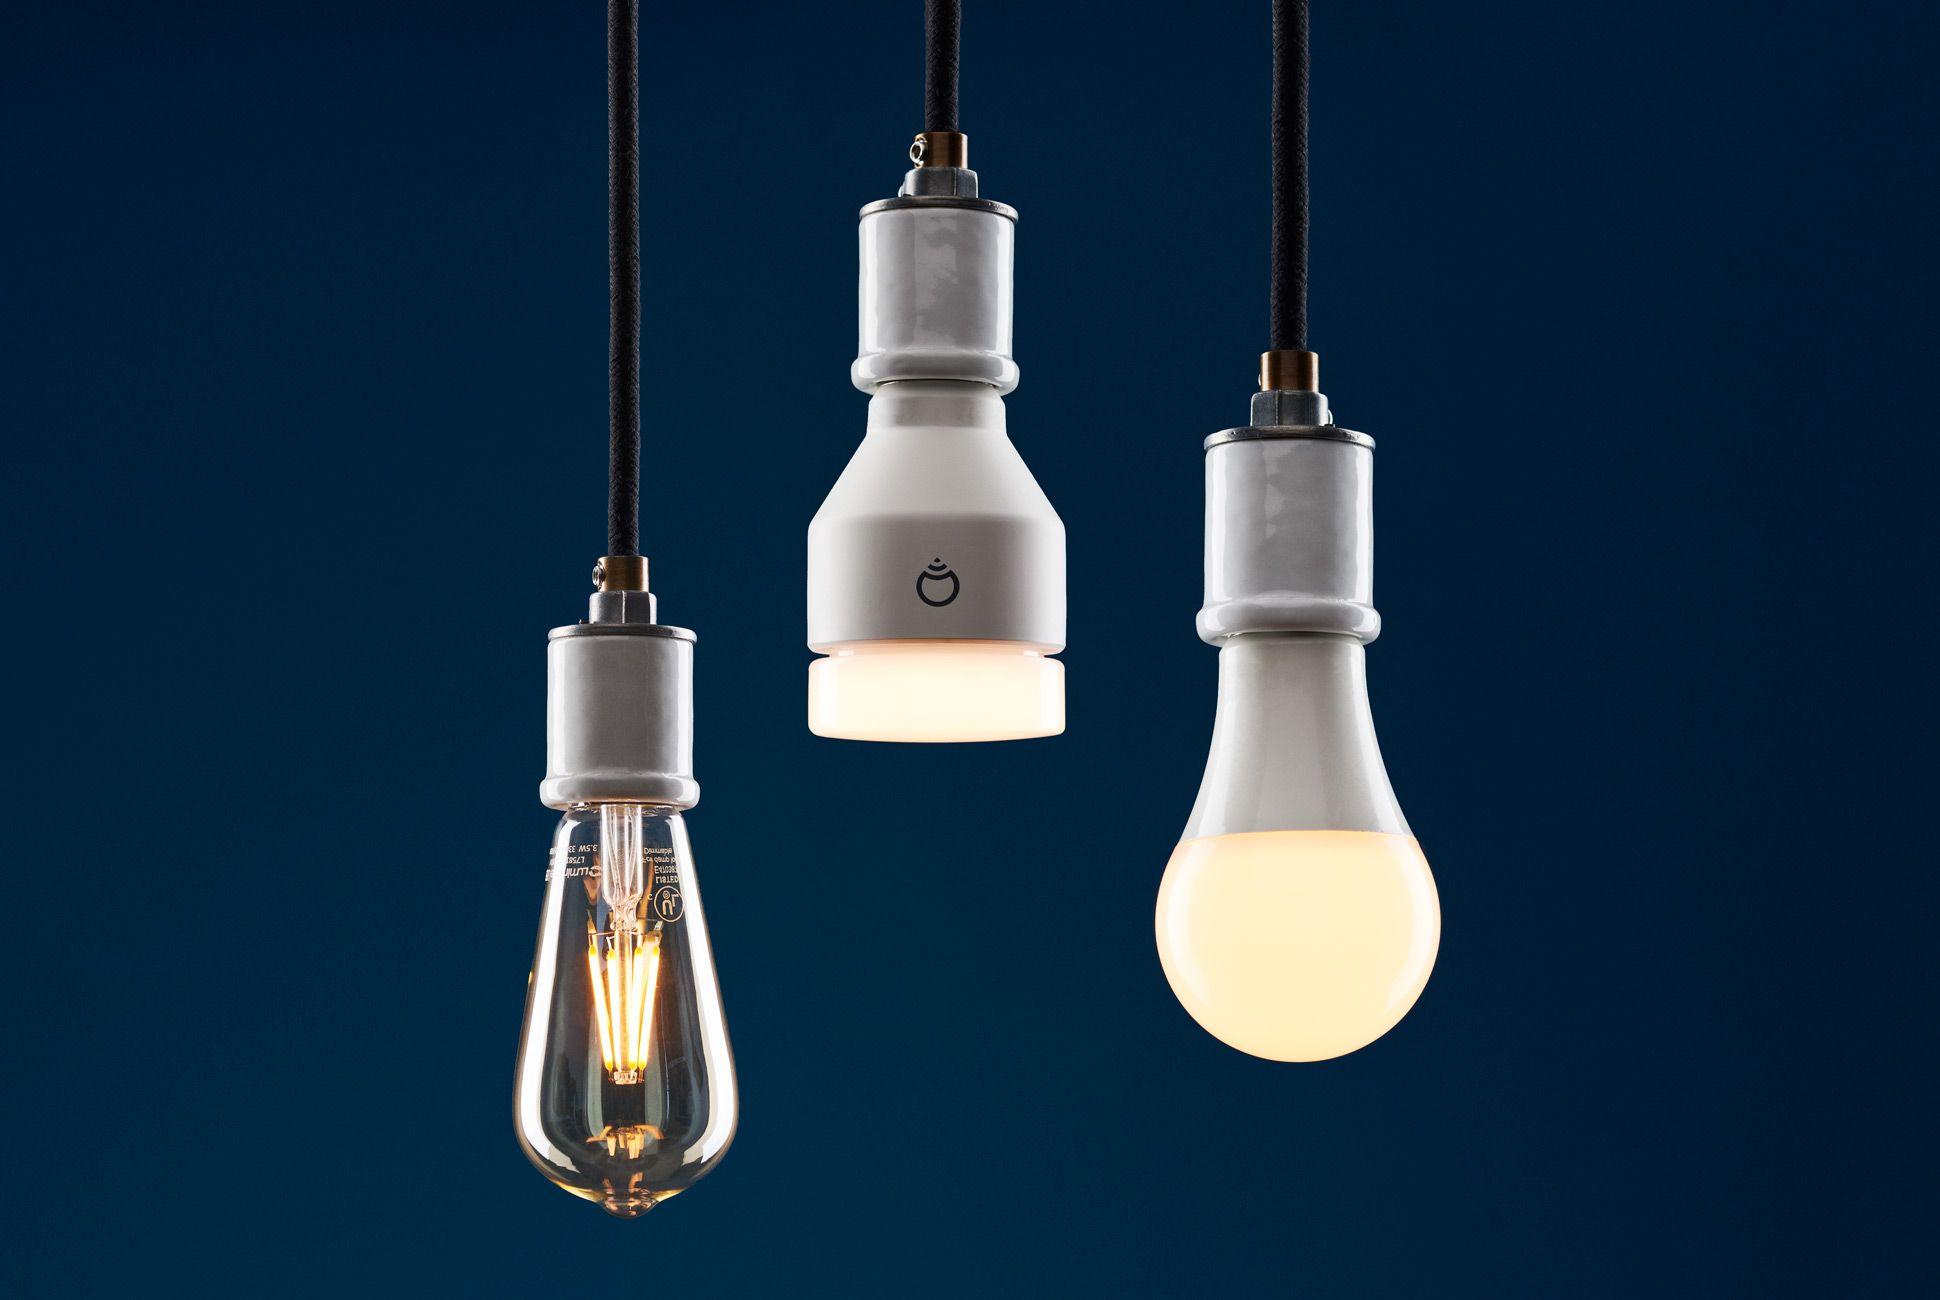 Light Bulbs For A Calm And Cozy Living